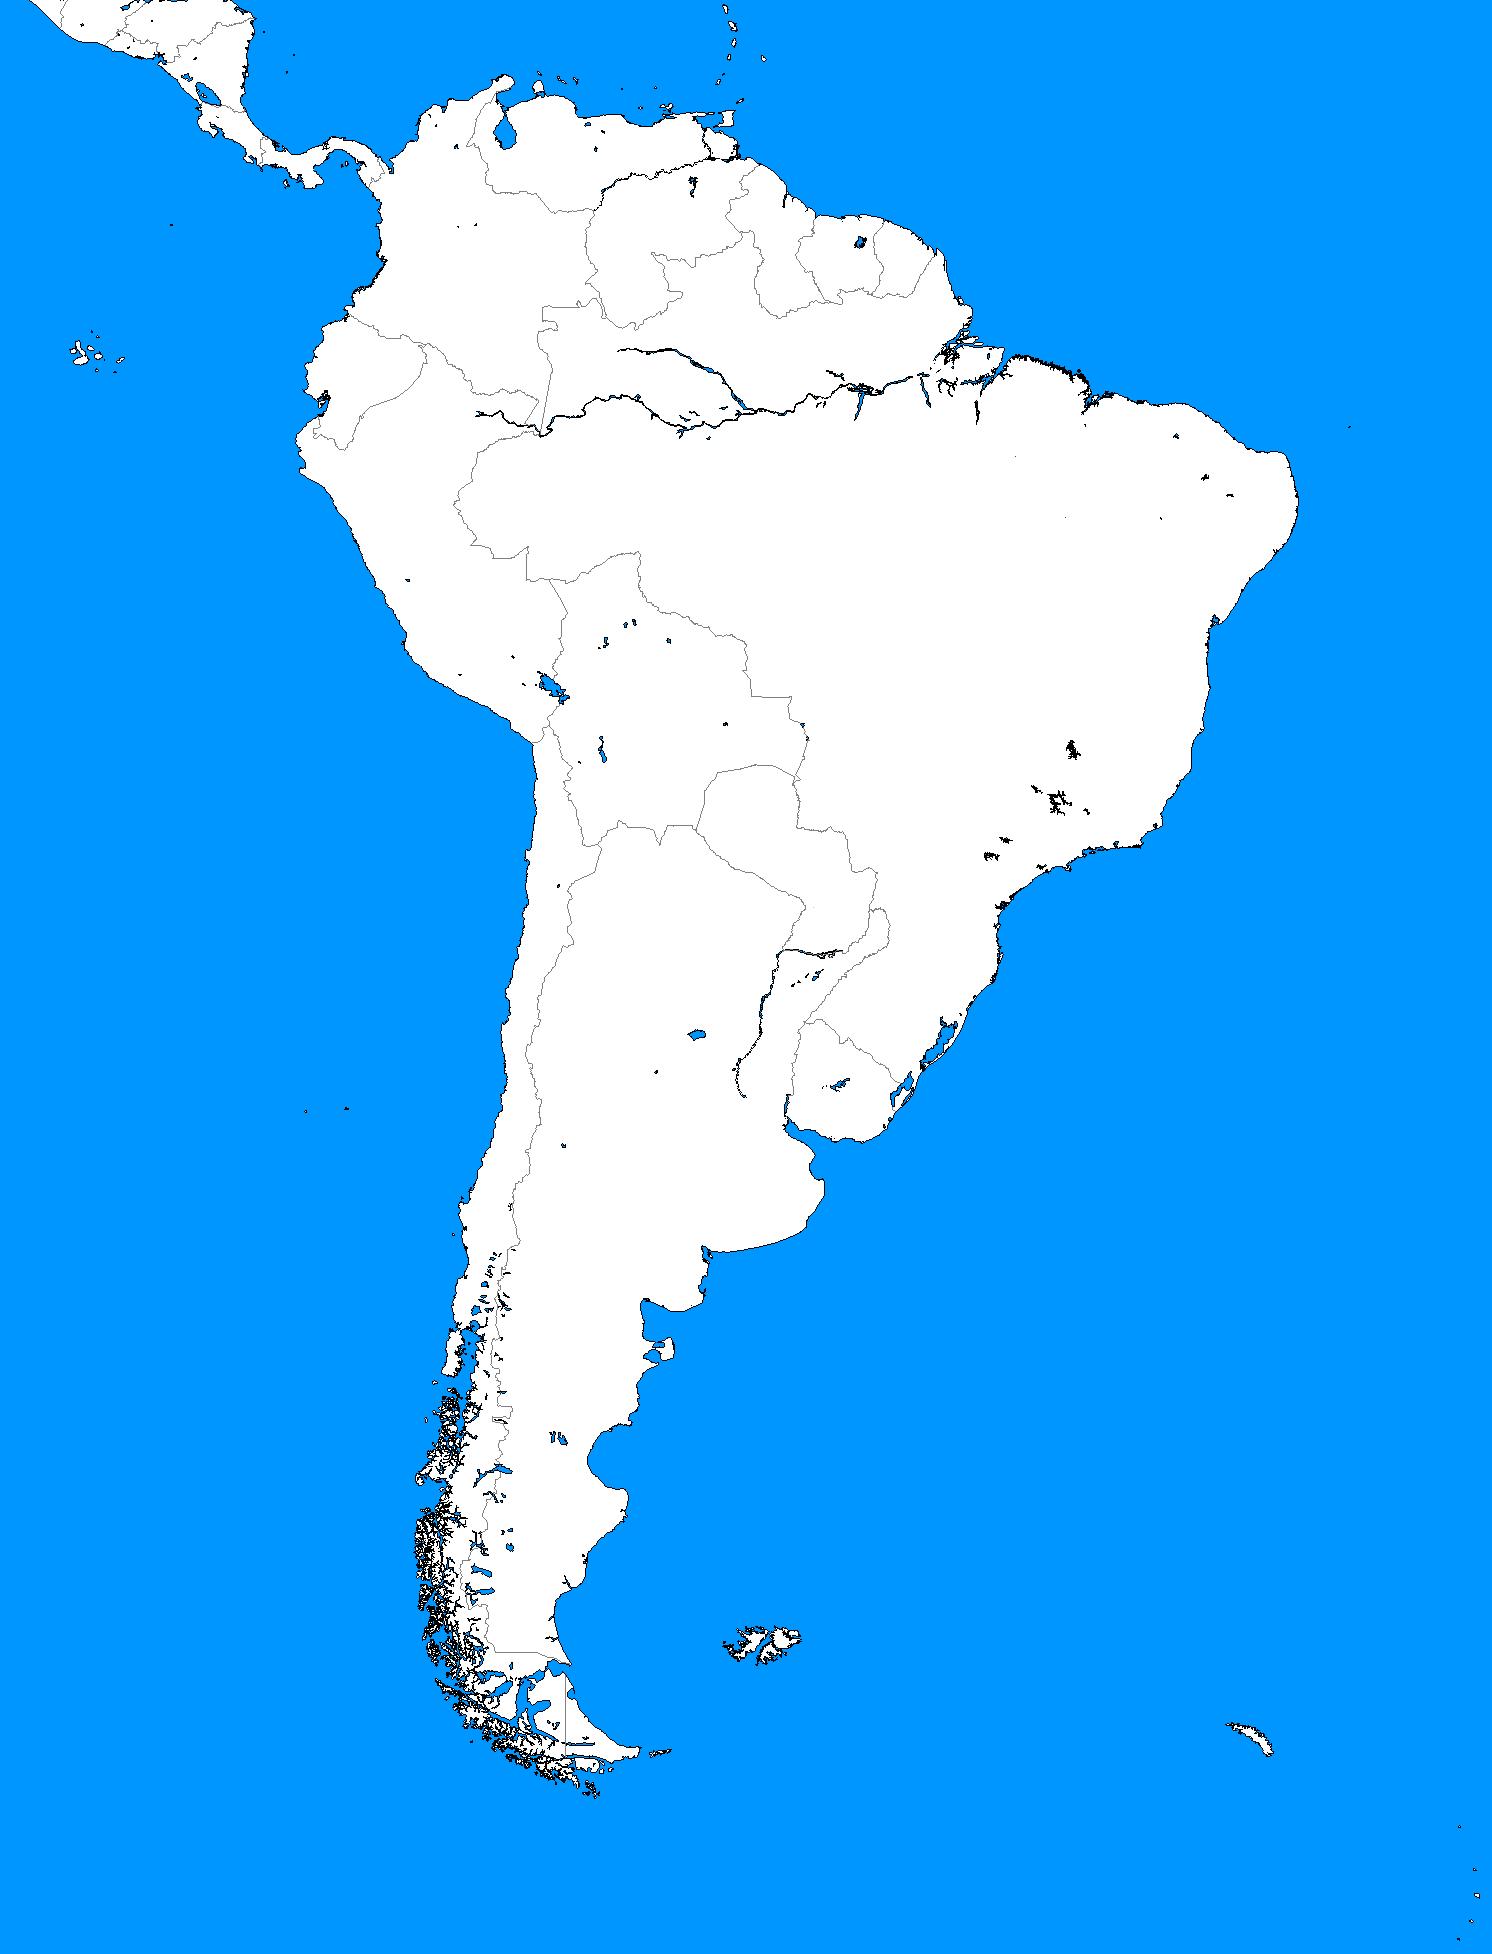 Blankmapdirectorysouthamerica Alternatehistorycom Wiki - South america map outline